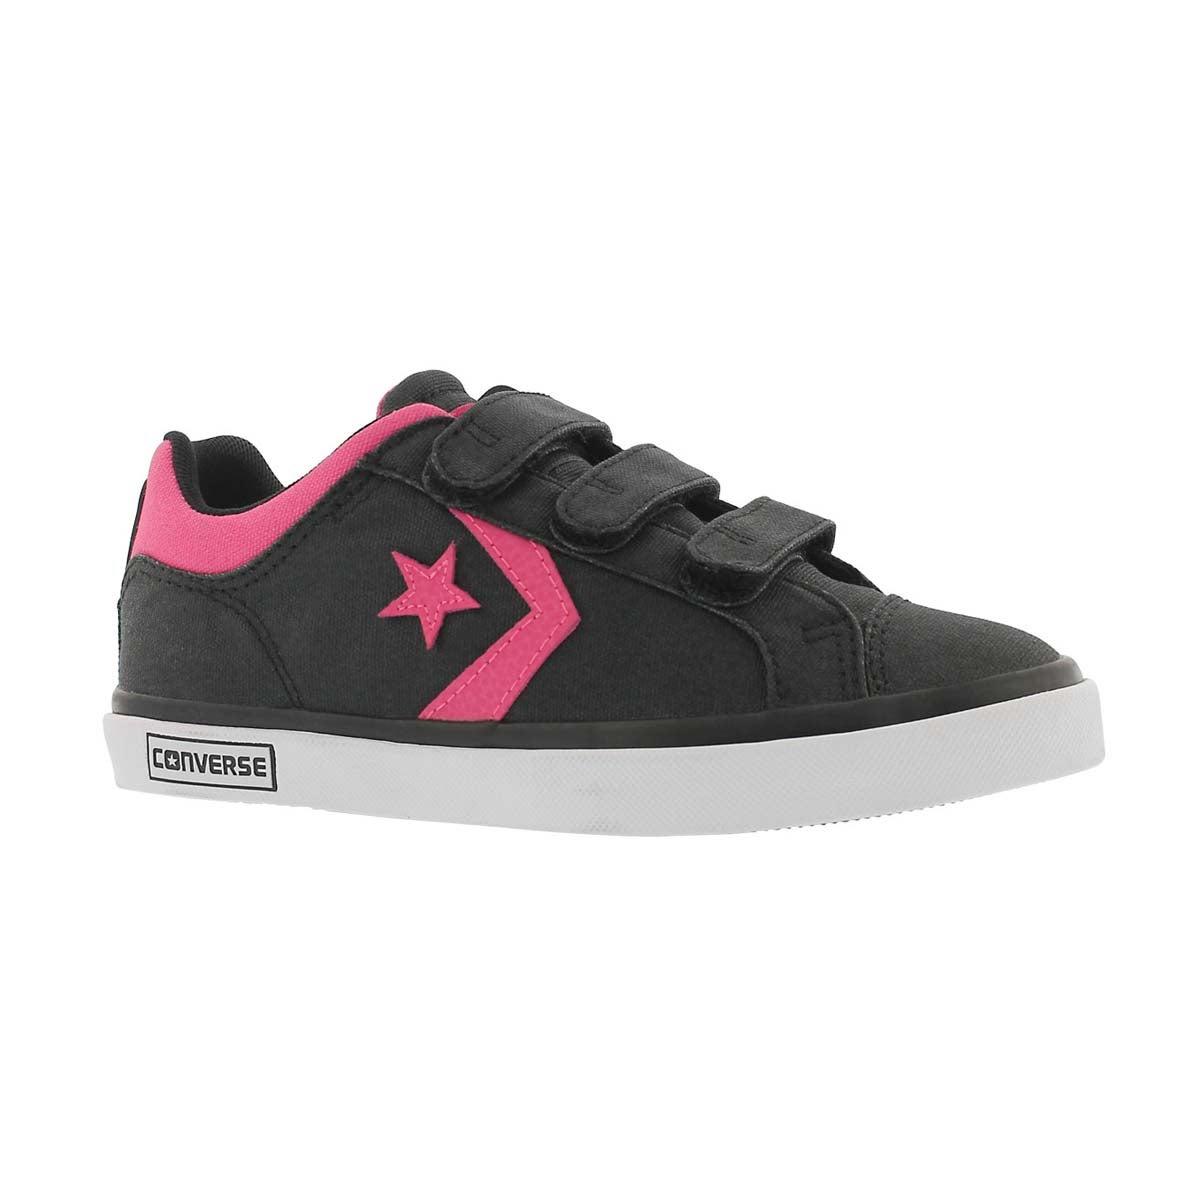 Girls' STAR STREET 3V black/pink sneakers